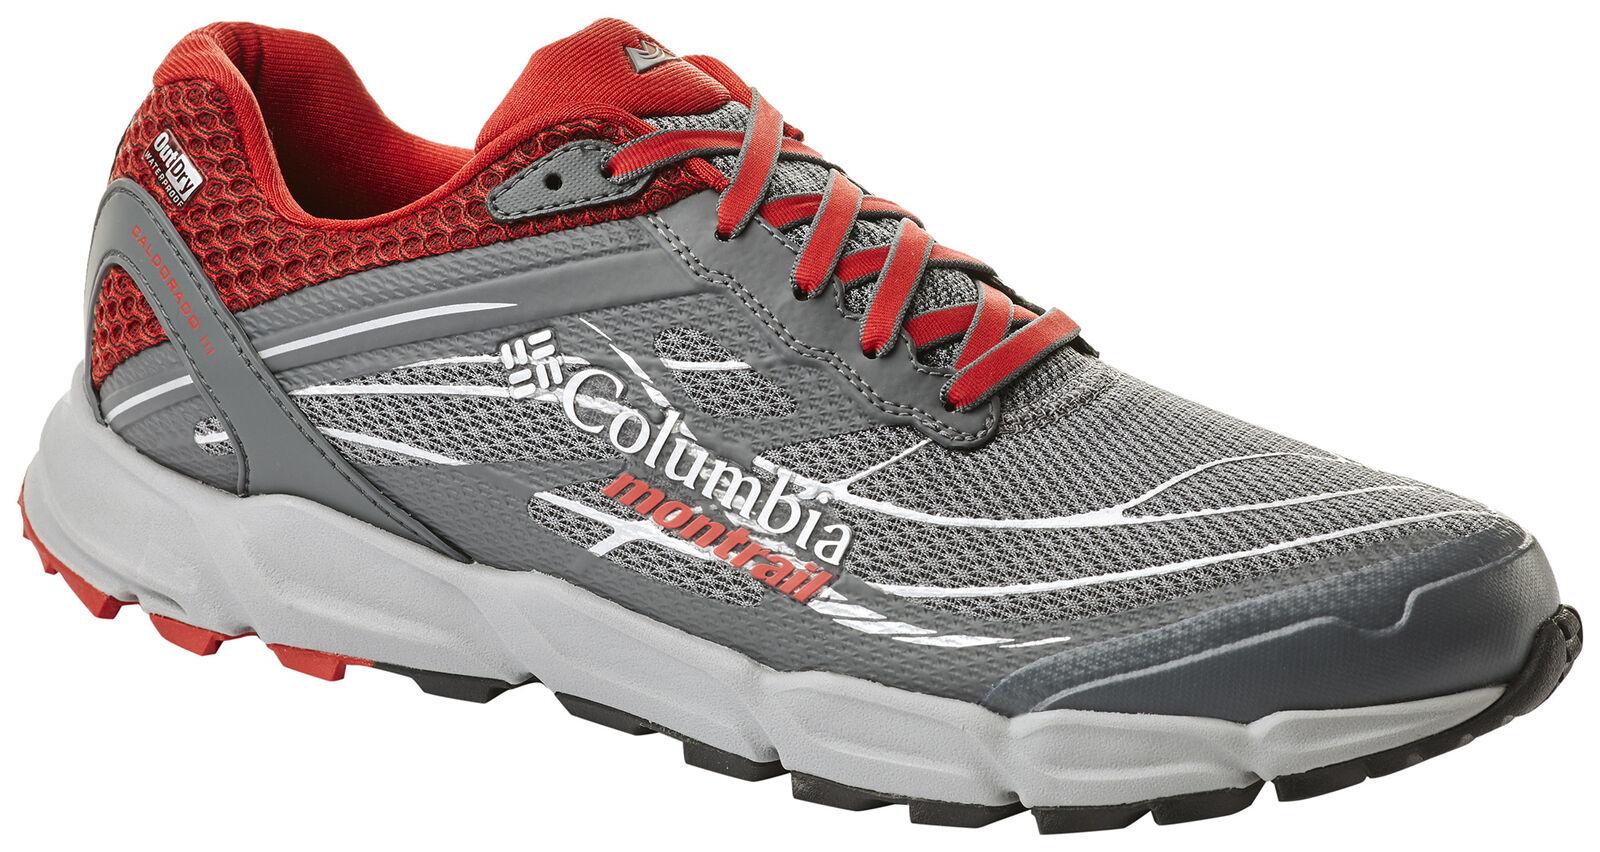 9a542b2328254 Caldorado III Outdry shoes Ti Grey Steel Men s Columbia nsuybj8268 ...